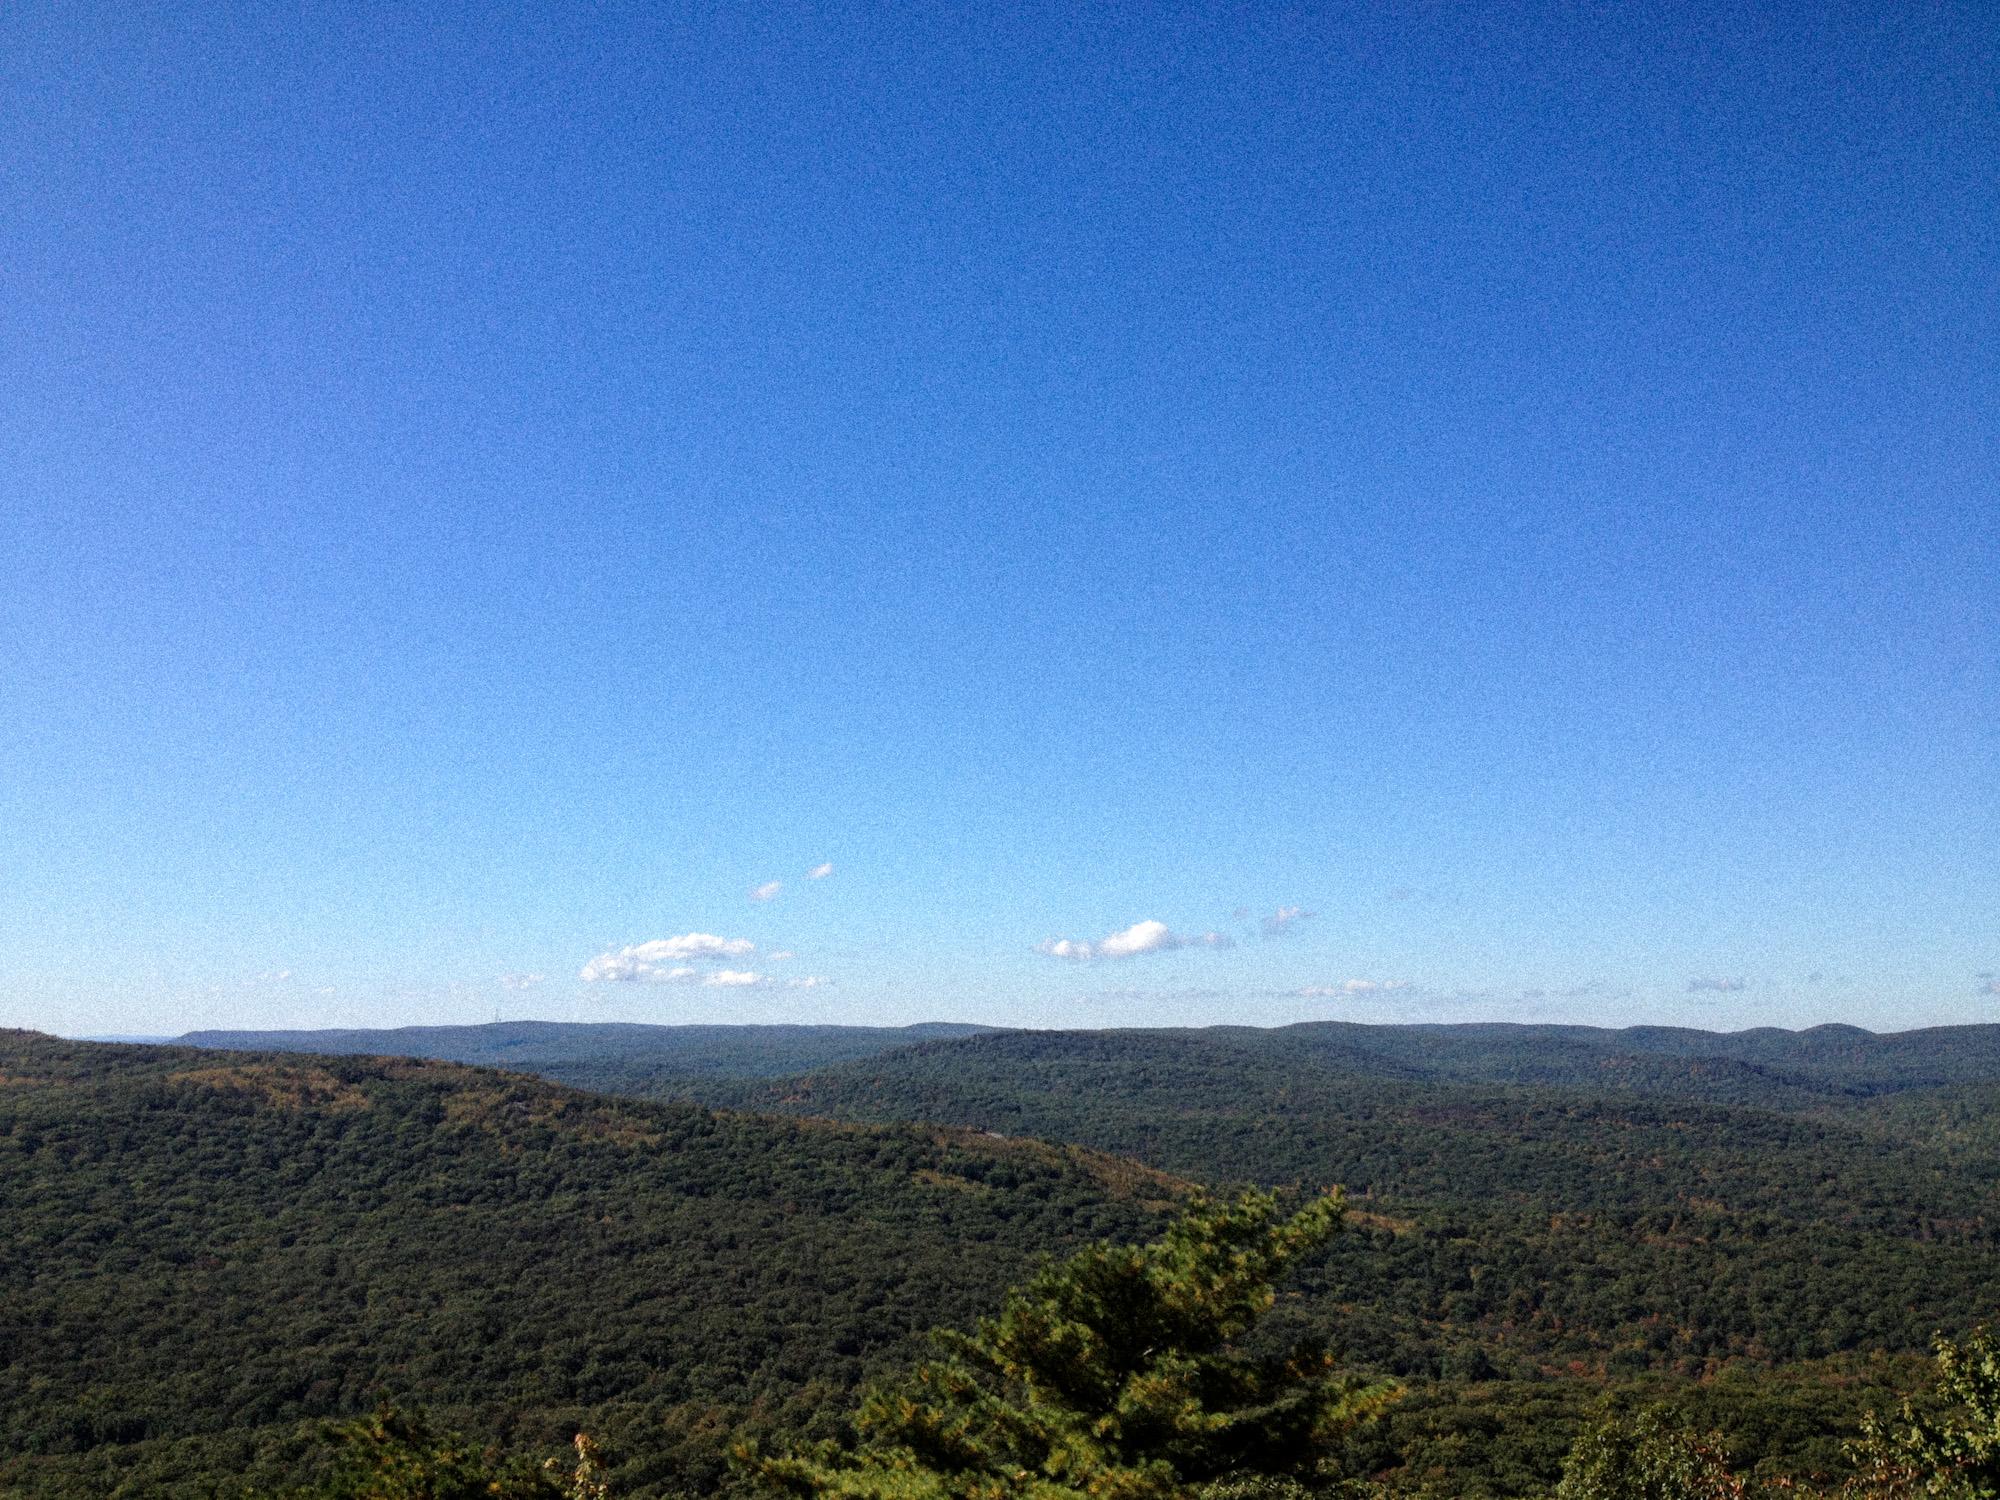 bear_mountain-4598.jpg